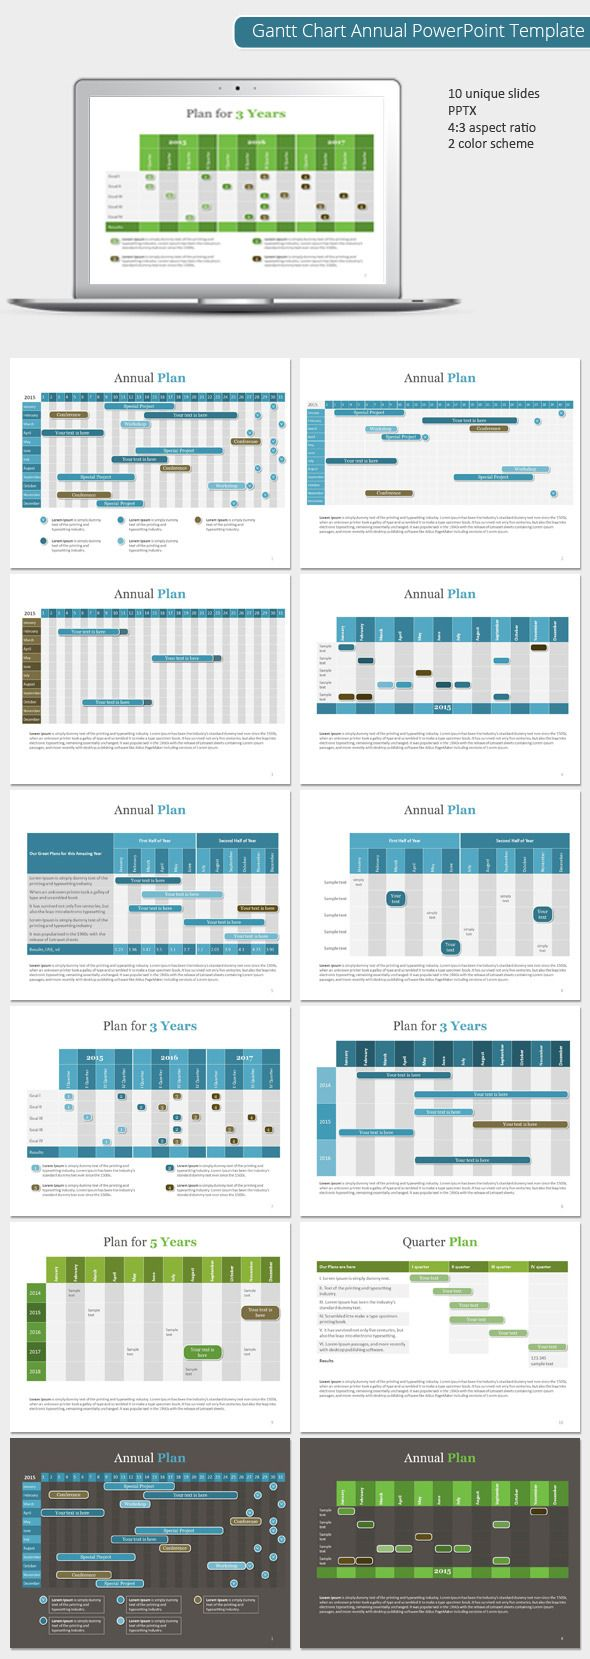 Gantt Chart Annual PowerPoint Template (Powerpoint Templates) preview